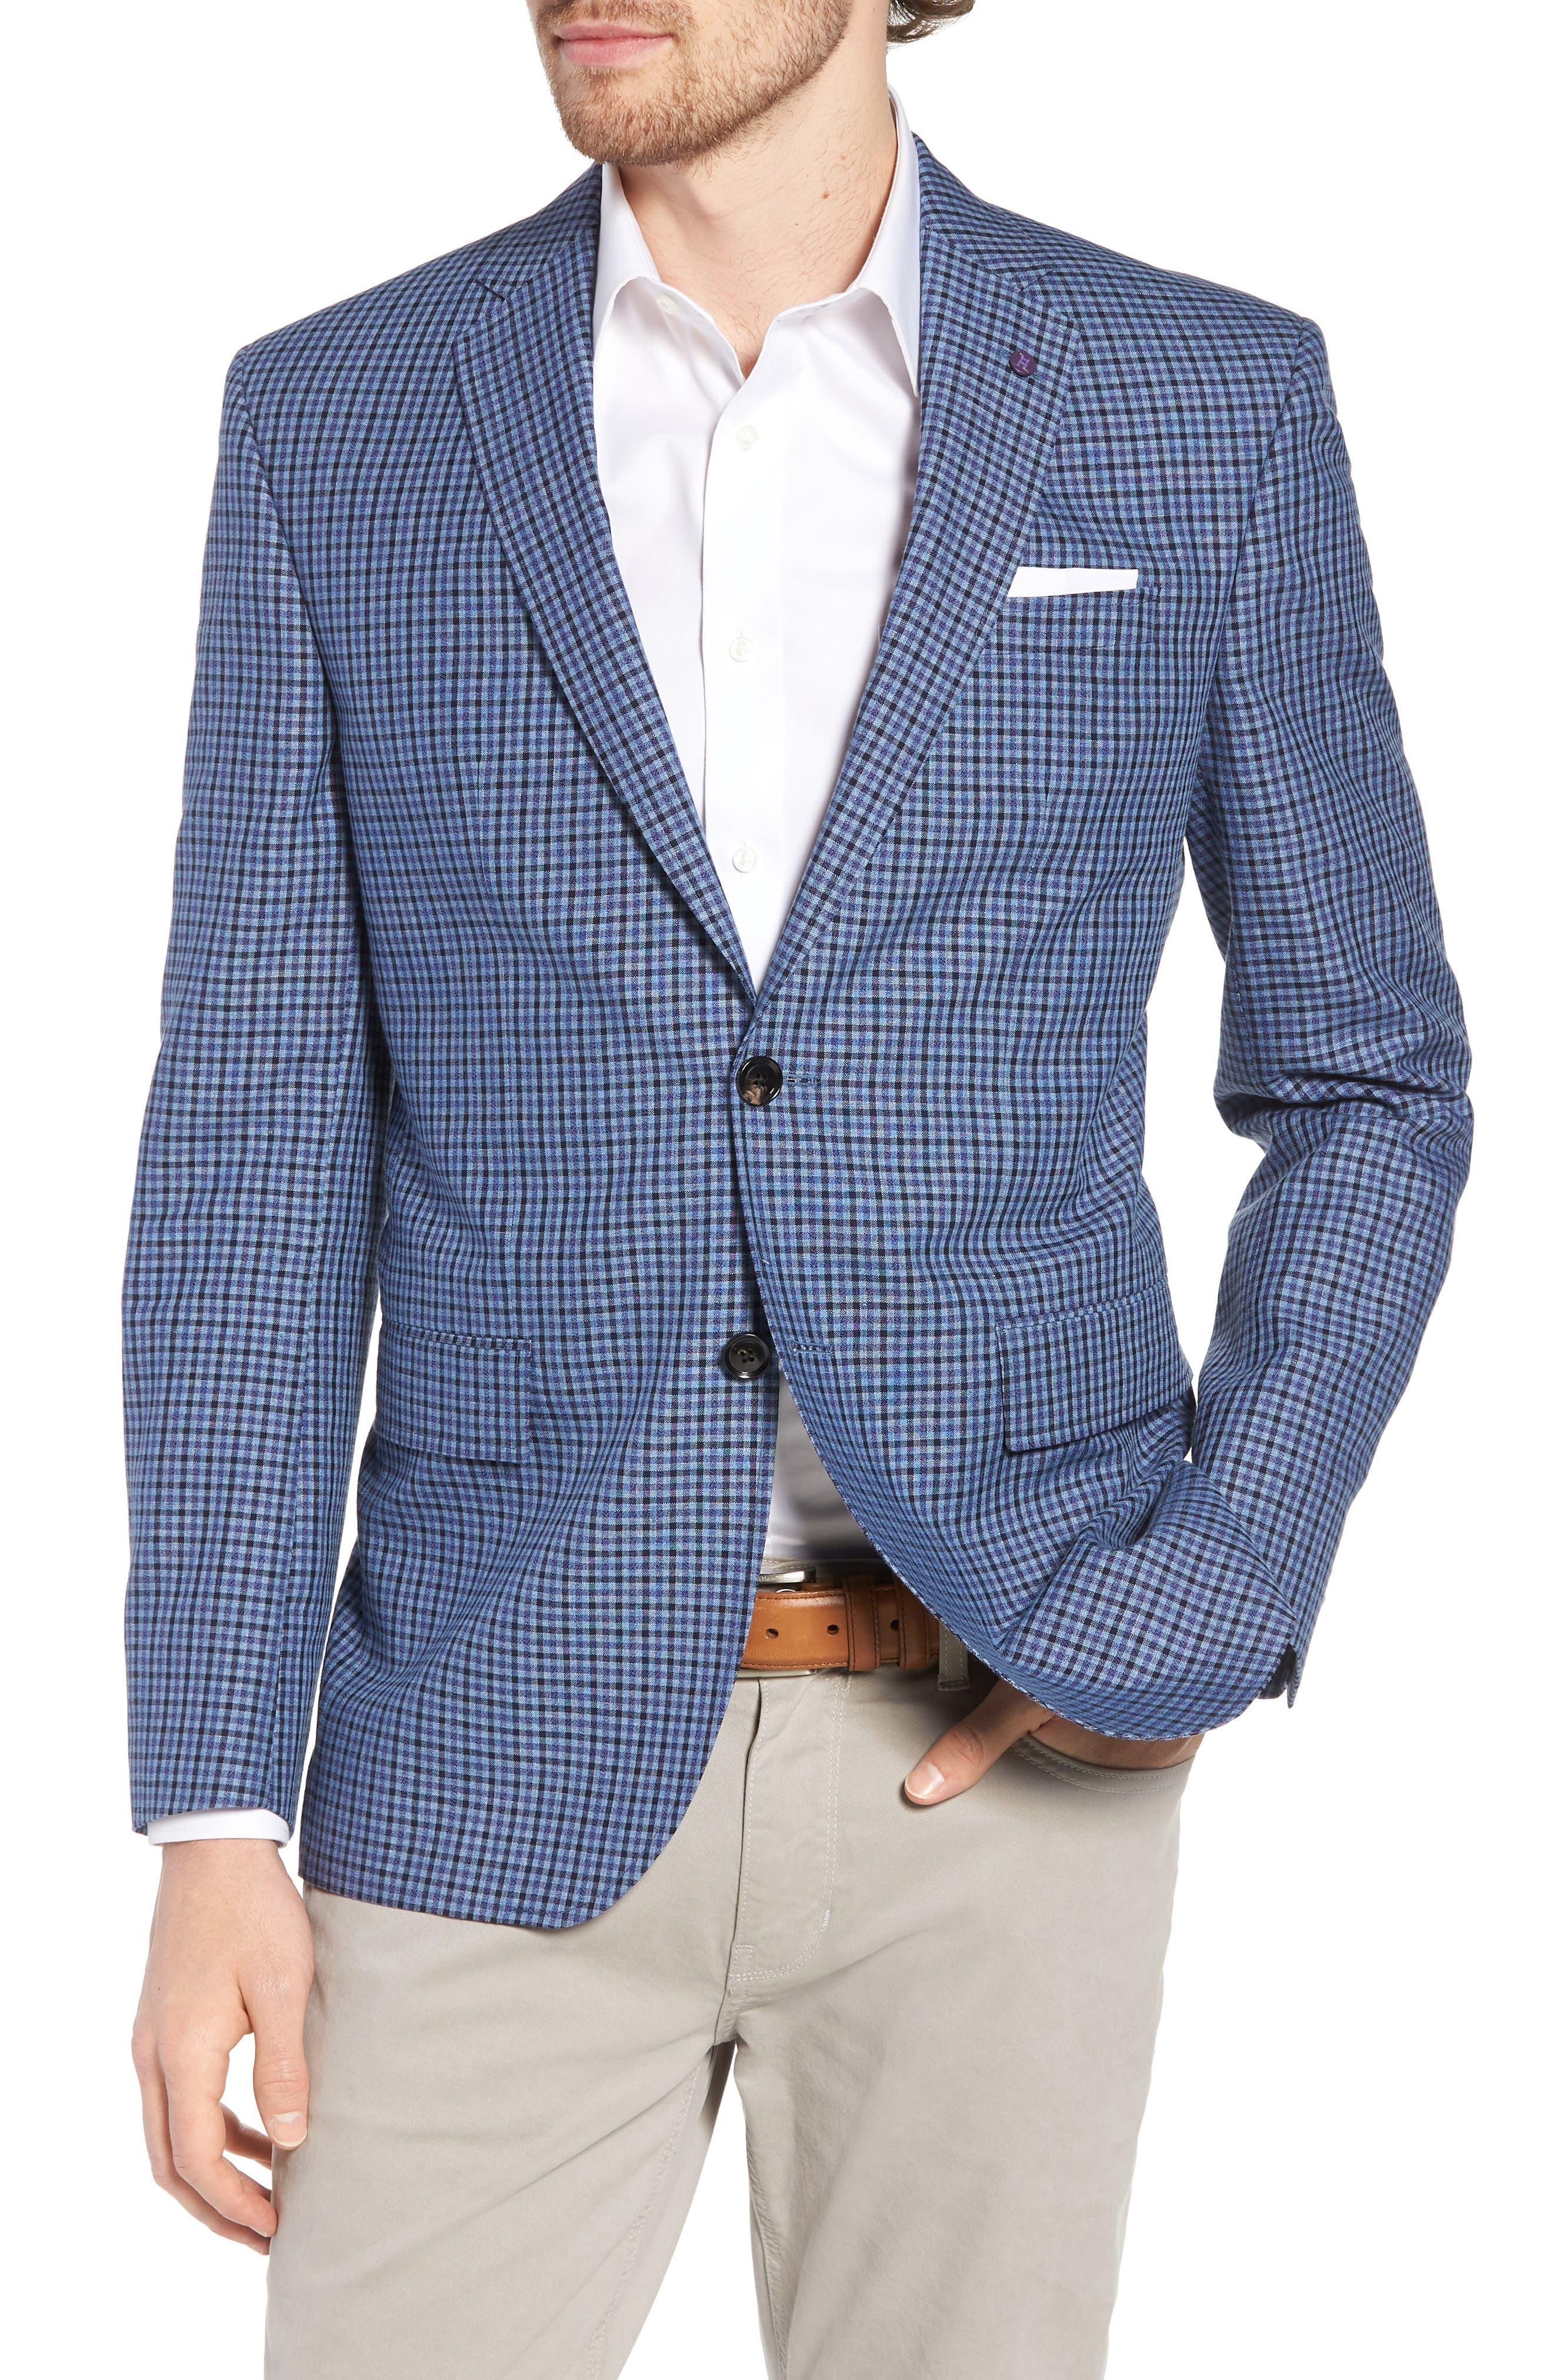 Jay Trim Fit Check Wool & Linen Sport Coat,                             Main thumbnail 1, color,                             Blue